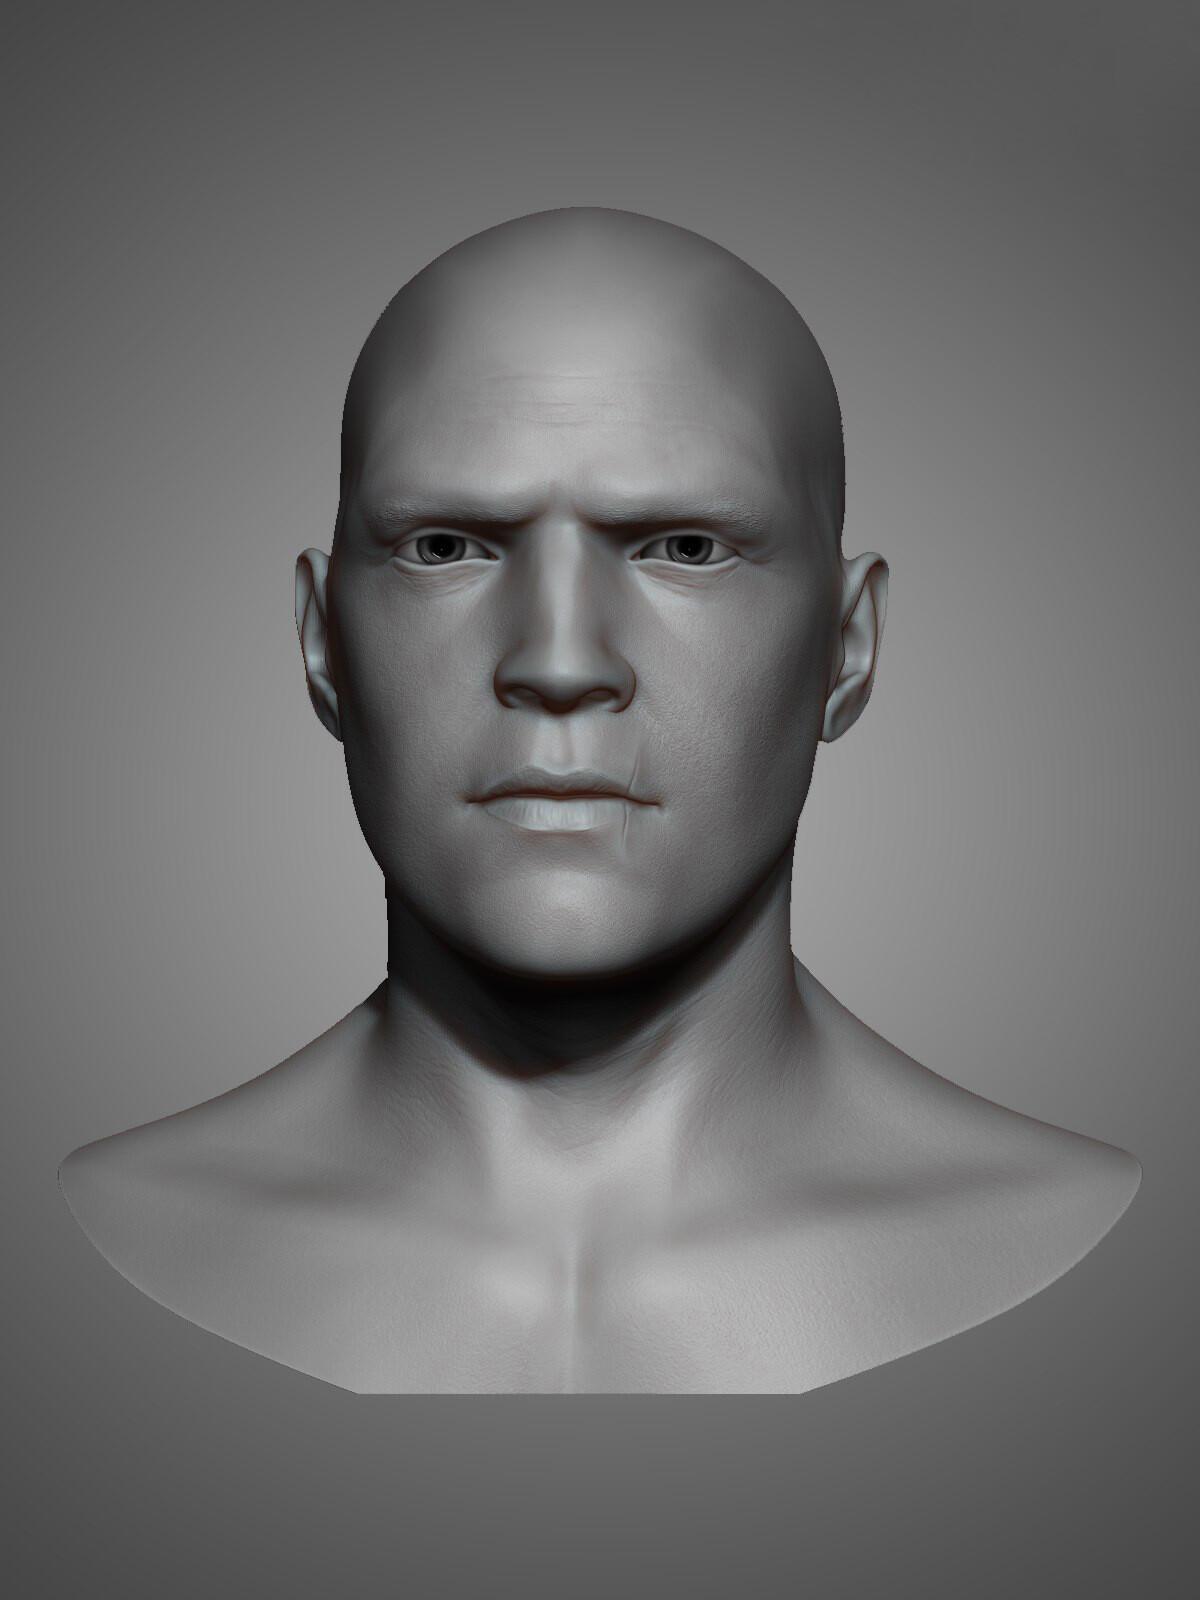 Test sculpting of head